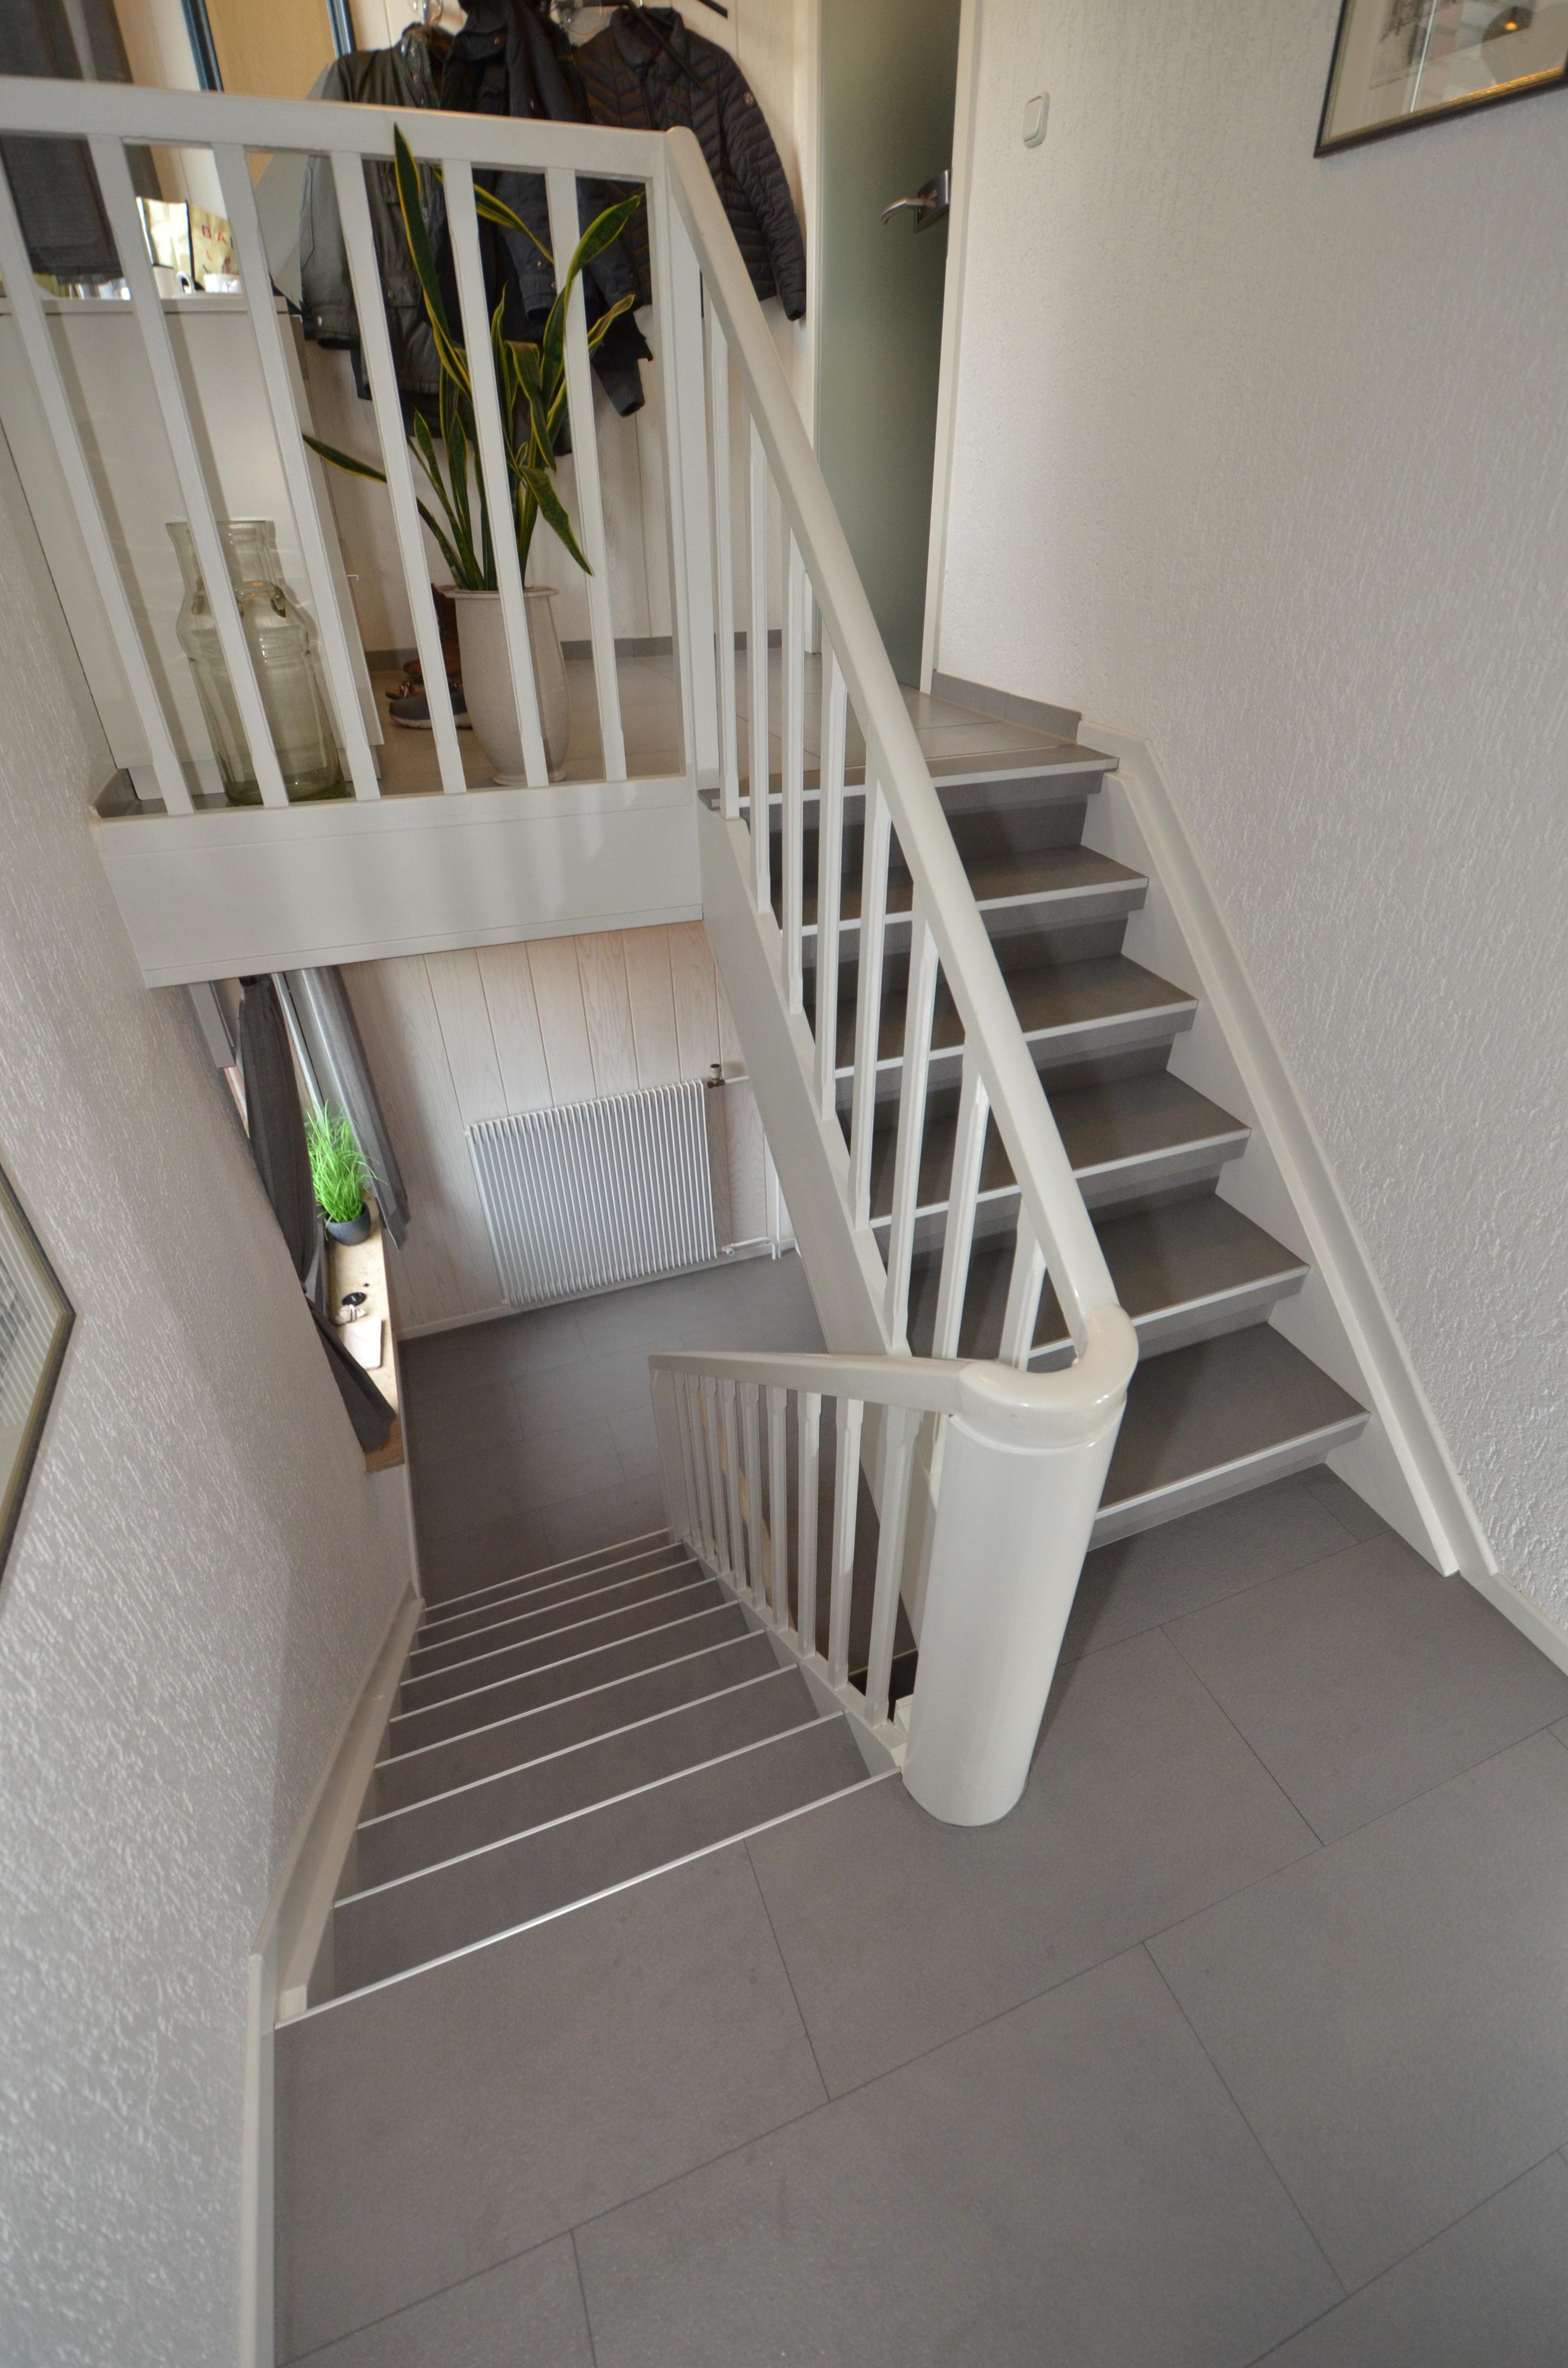 Solidline Laminat in moderner Granit Optik - JOWI Holz-Innenausbau ...